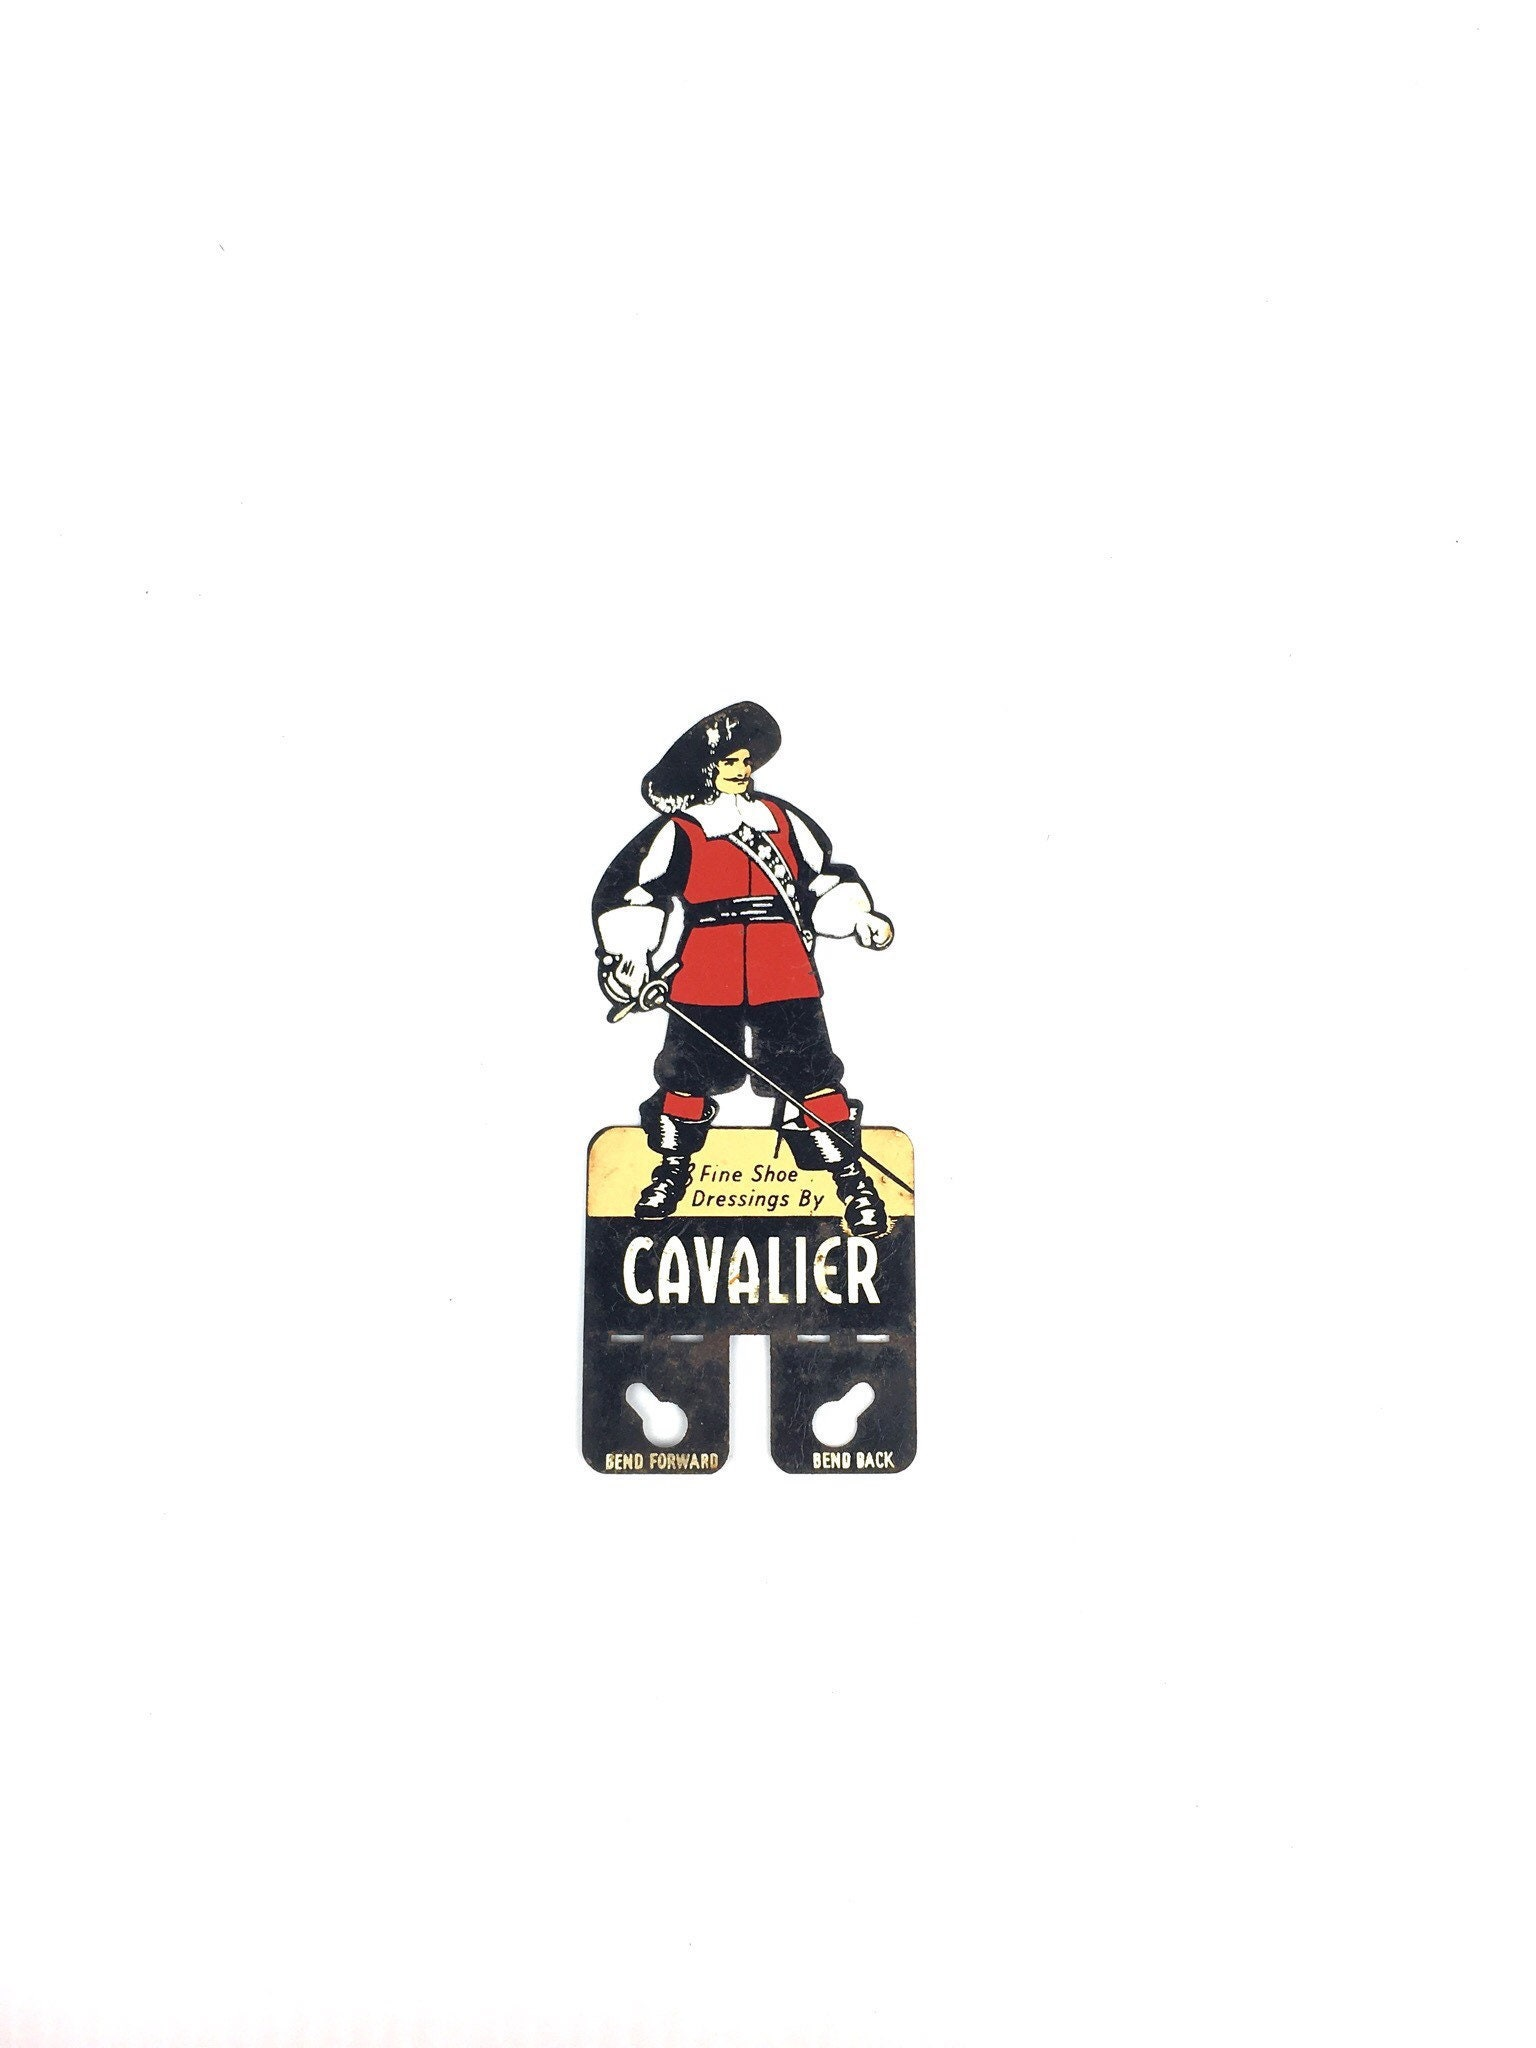 Antique Cavalier Shoes Advertising Topper Rare 1930s Boot Die Cut Metal Cavalier Boot 1930s Die Cut Advertising Topper 06cfbe